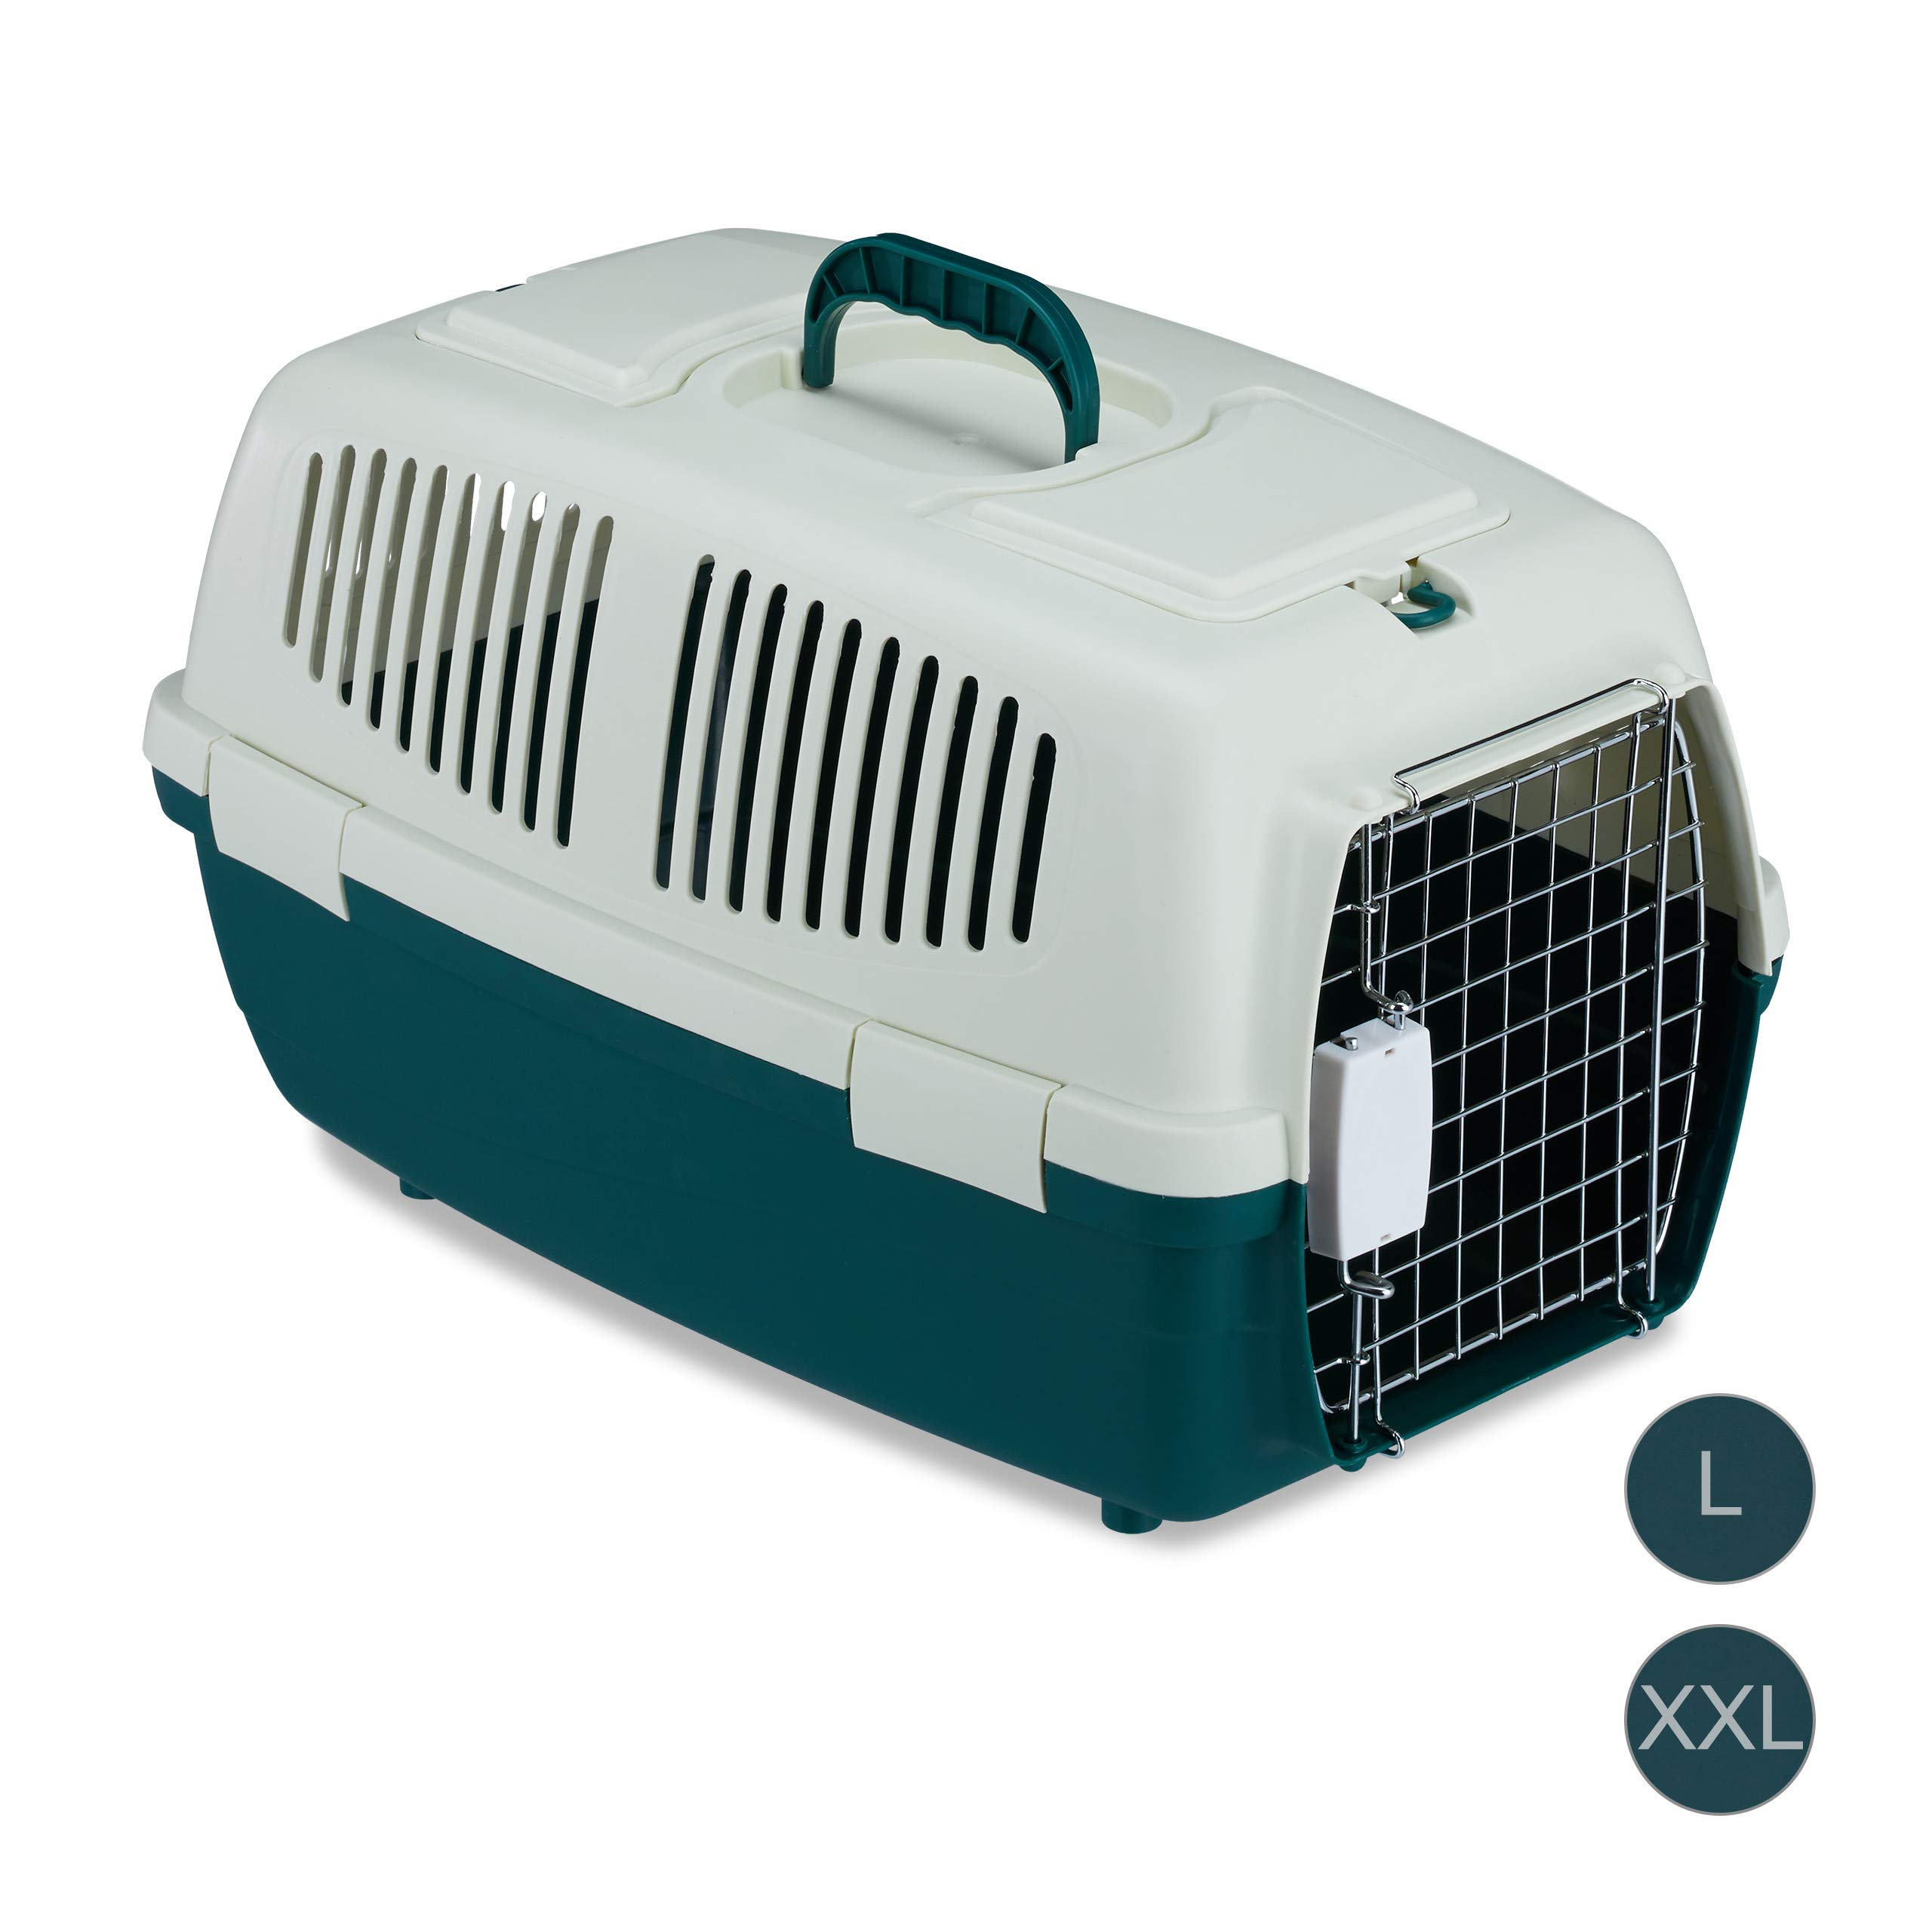 Relaxdays Transportín Perro, Gato o Conejo para Coche o Avión, Polipropileno-Metal, Blanco-Verde, 32x35x53cm: Amazon.es: Productos para mascotas